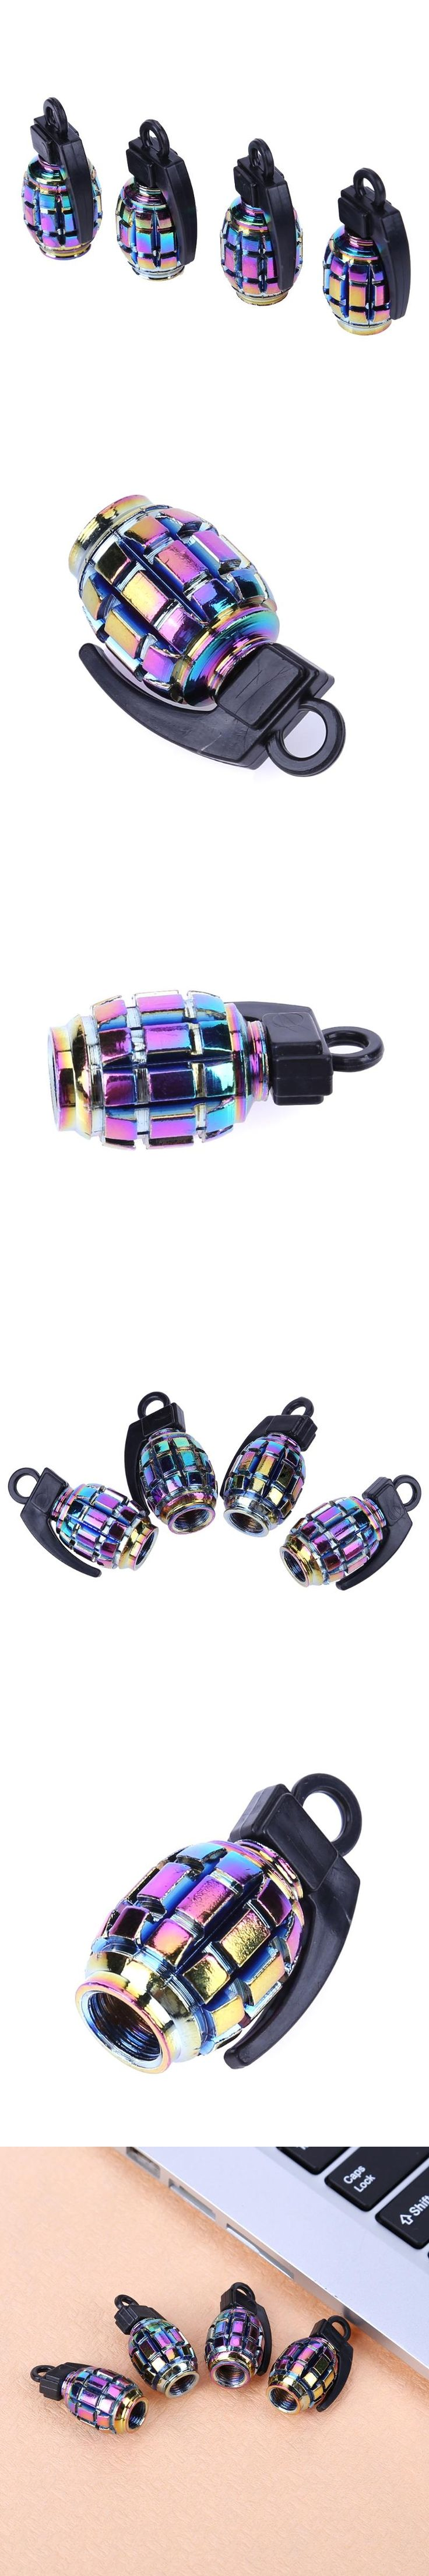 4pcs/set Rainbow Color Car Tire Aluminum Dust Caps Covers Motorcycle Dustproof Air Caps for Schrader Valves Car Styling